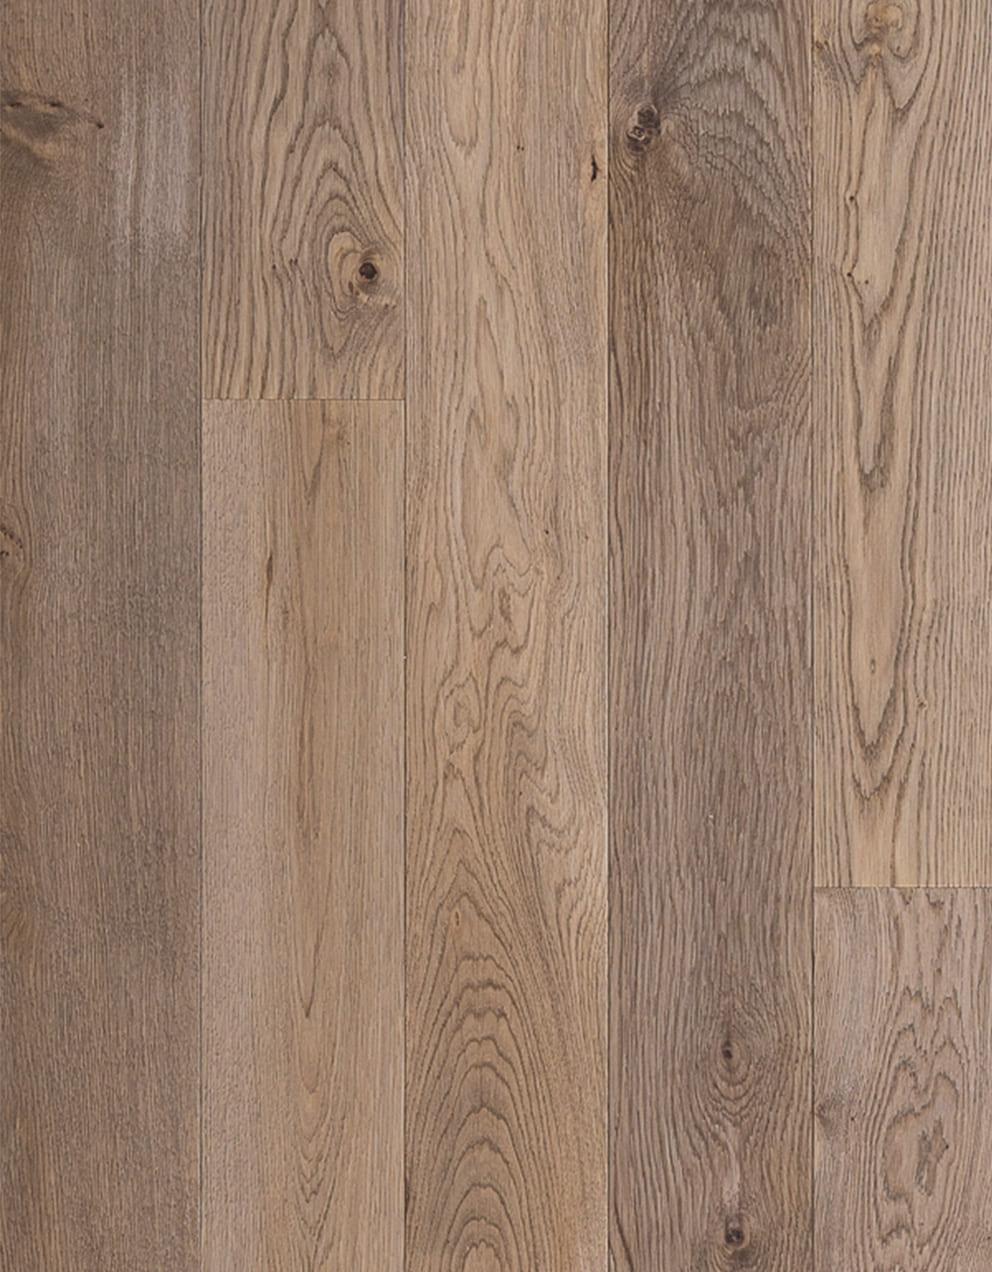 Suelo de madera Roble Francés